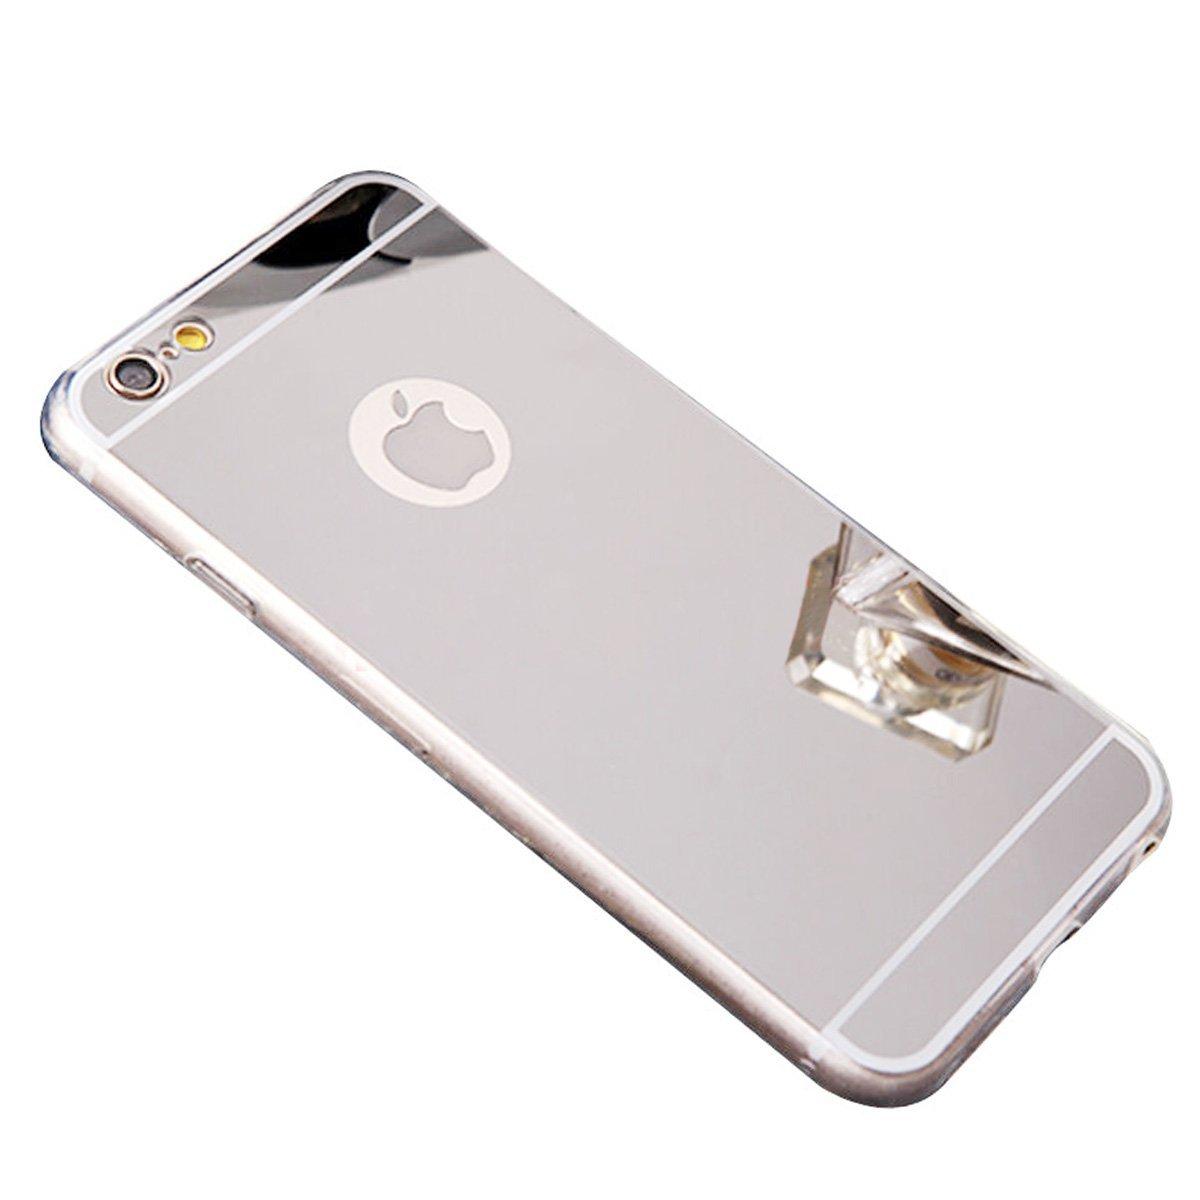 Zrcadlový kryt My Mirror pro iPhone 6s / 6 - Stříbrný (silver)